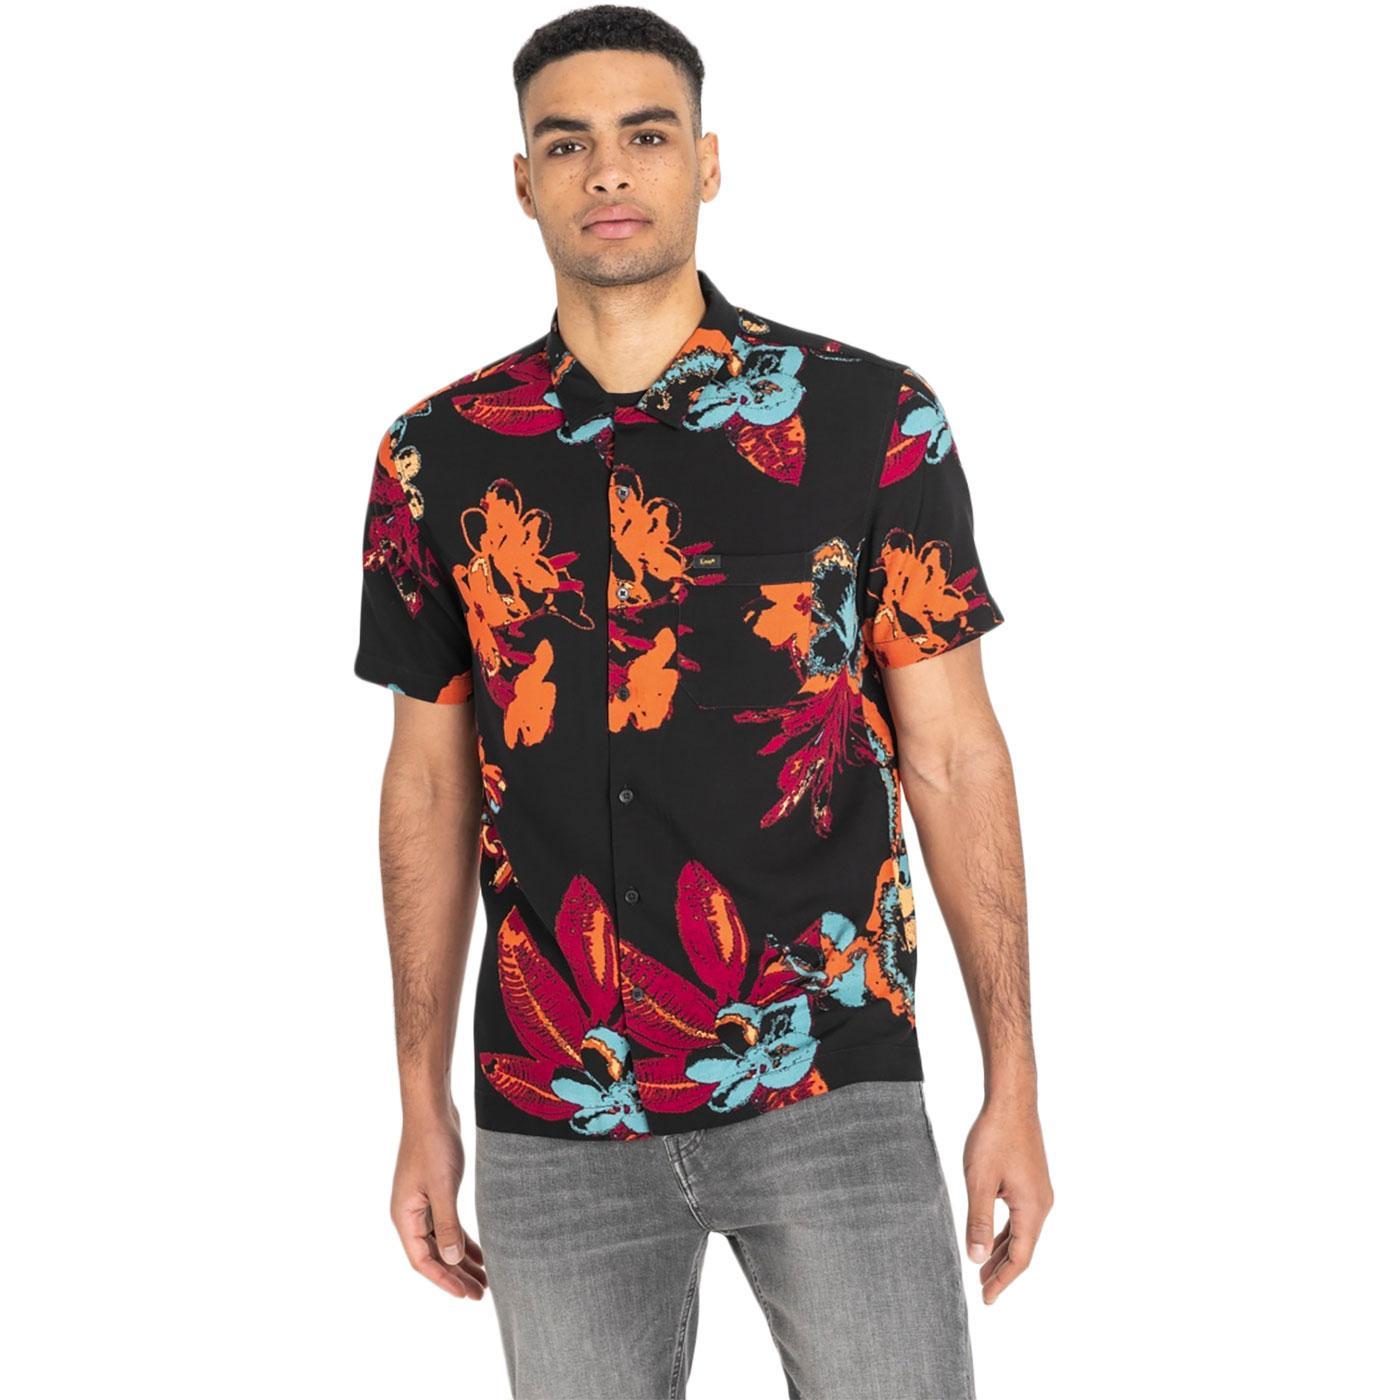 LEE Retro 1970s Bold Floral Hawaiian Shirt (Black)